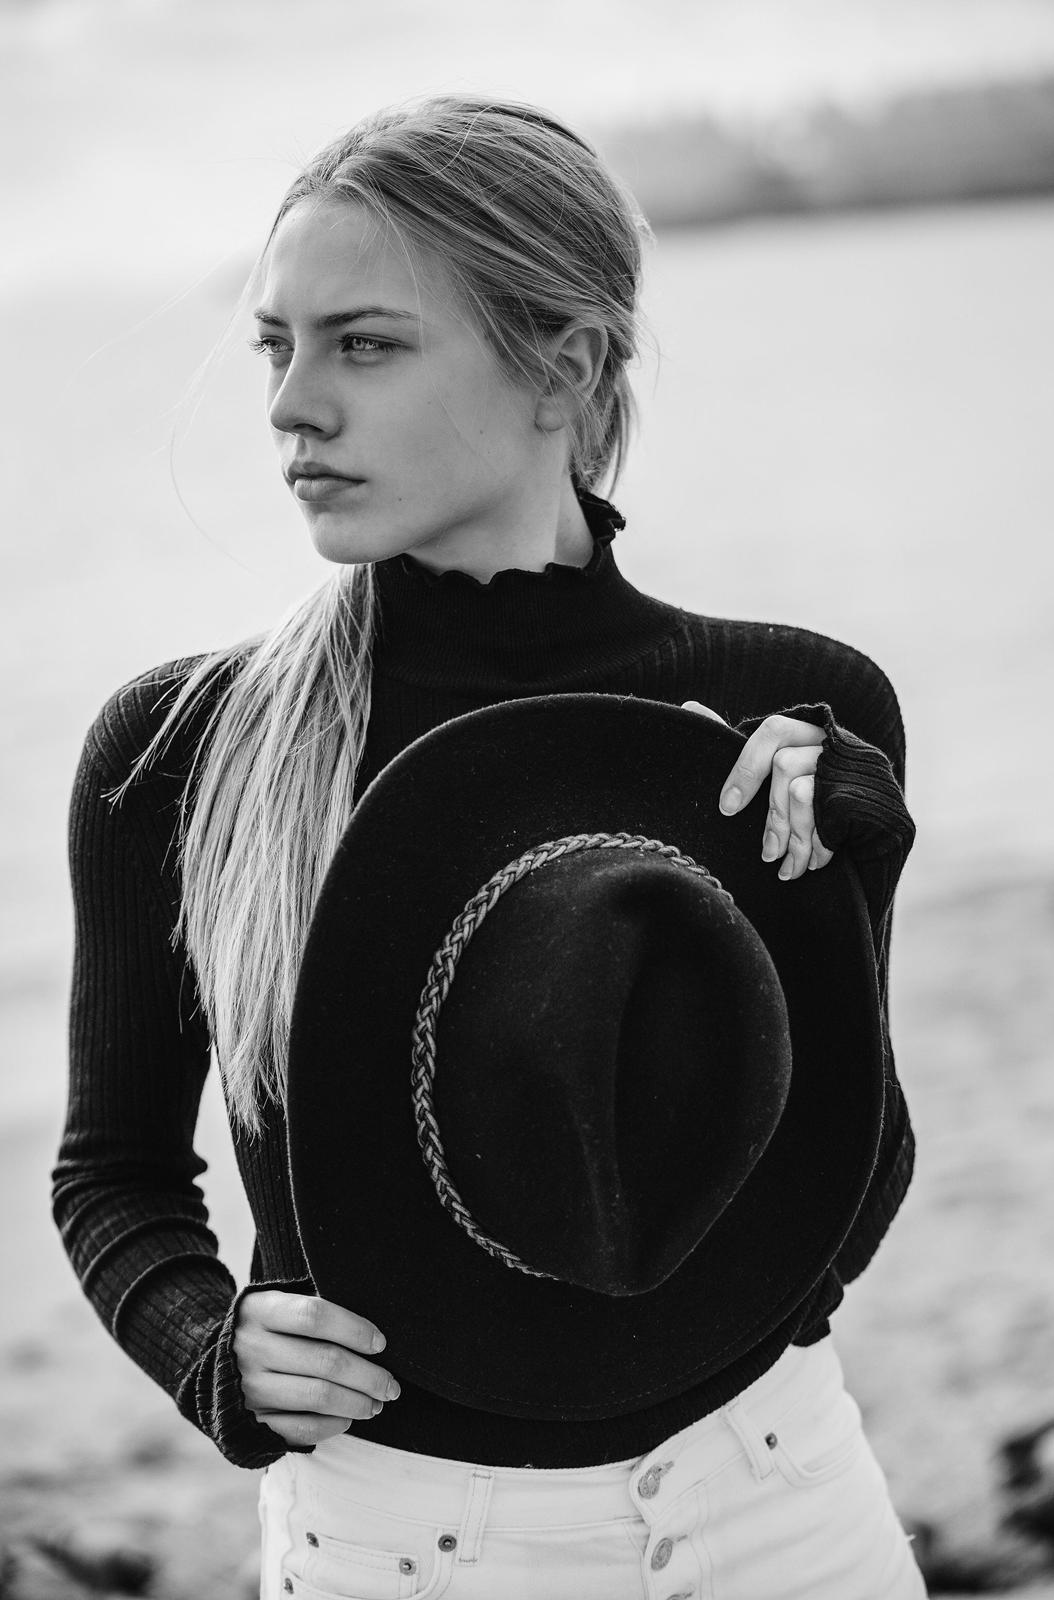 Martina Stetson